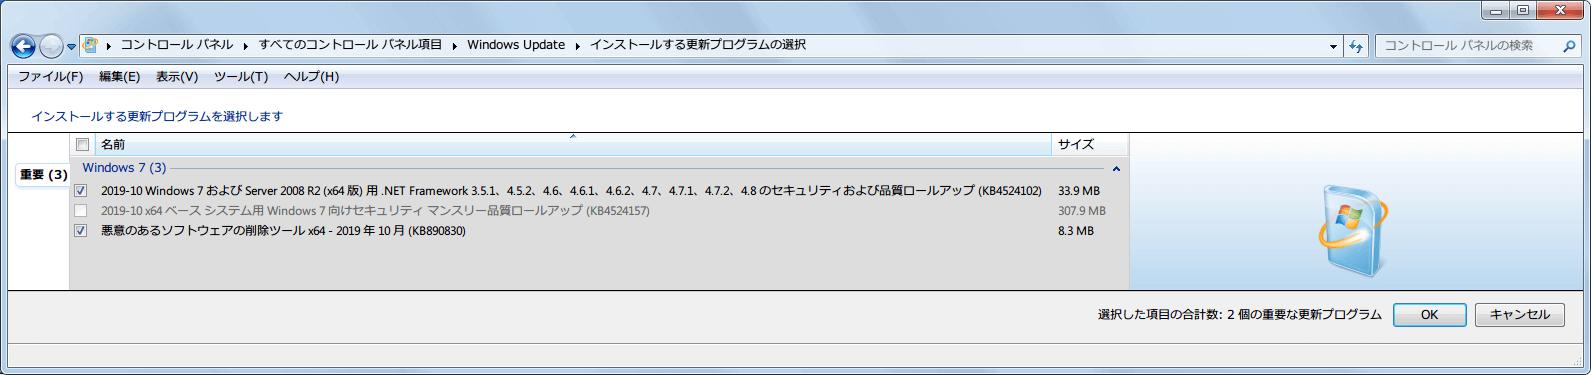 Windows 7 64bit Windows Update 重要 2019年10月分リスト KB4524157 非表示